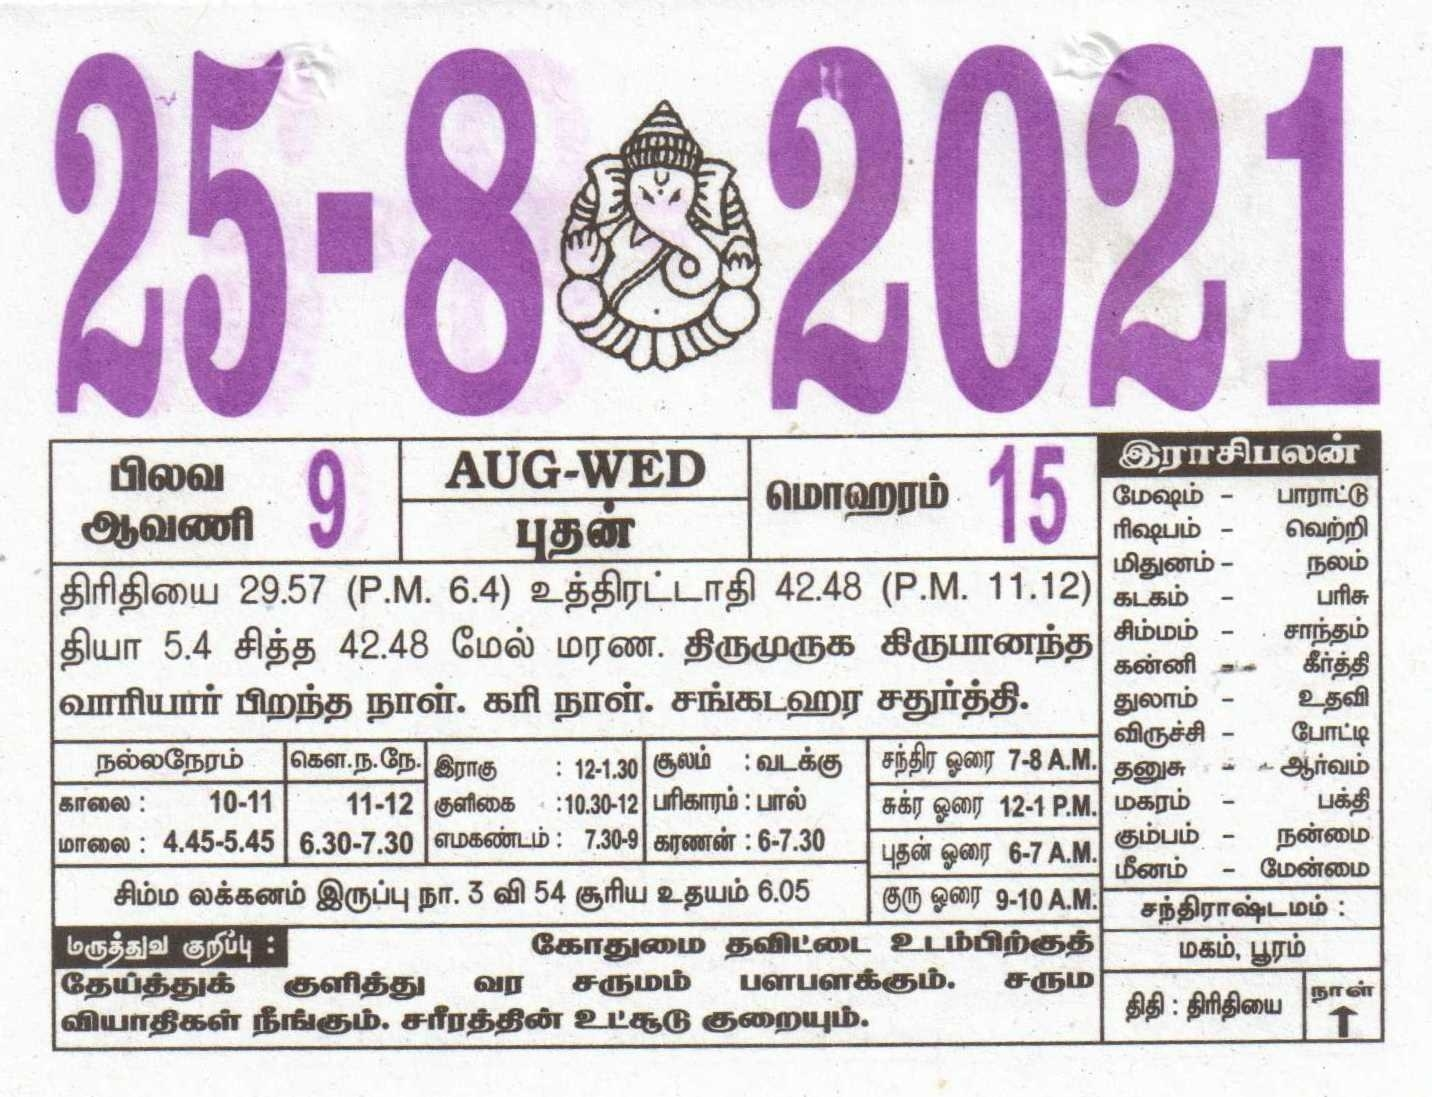 25-08-2021 Daily Calendar | Date 25 , January Daily Tear Off Calendar | Daily Panchangam Rasi Palan June 2021 Tamil Daily Calendar